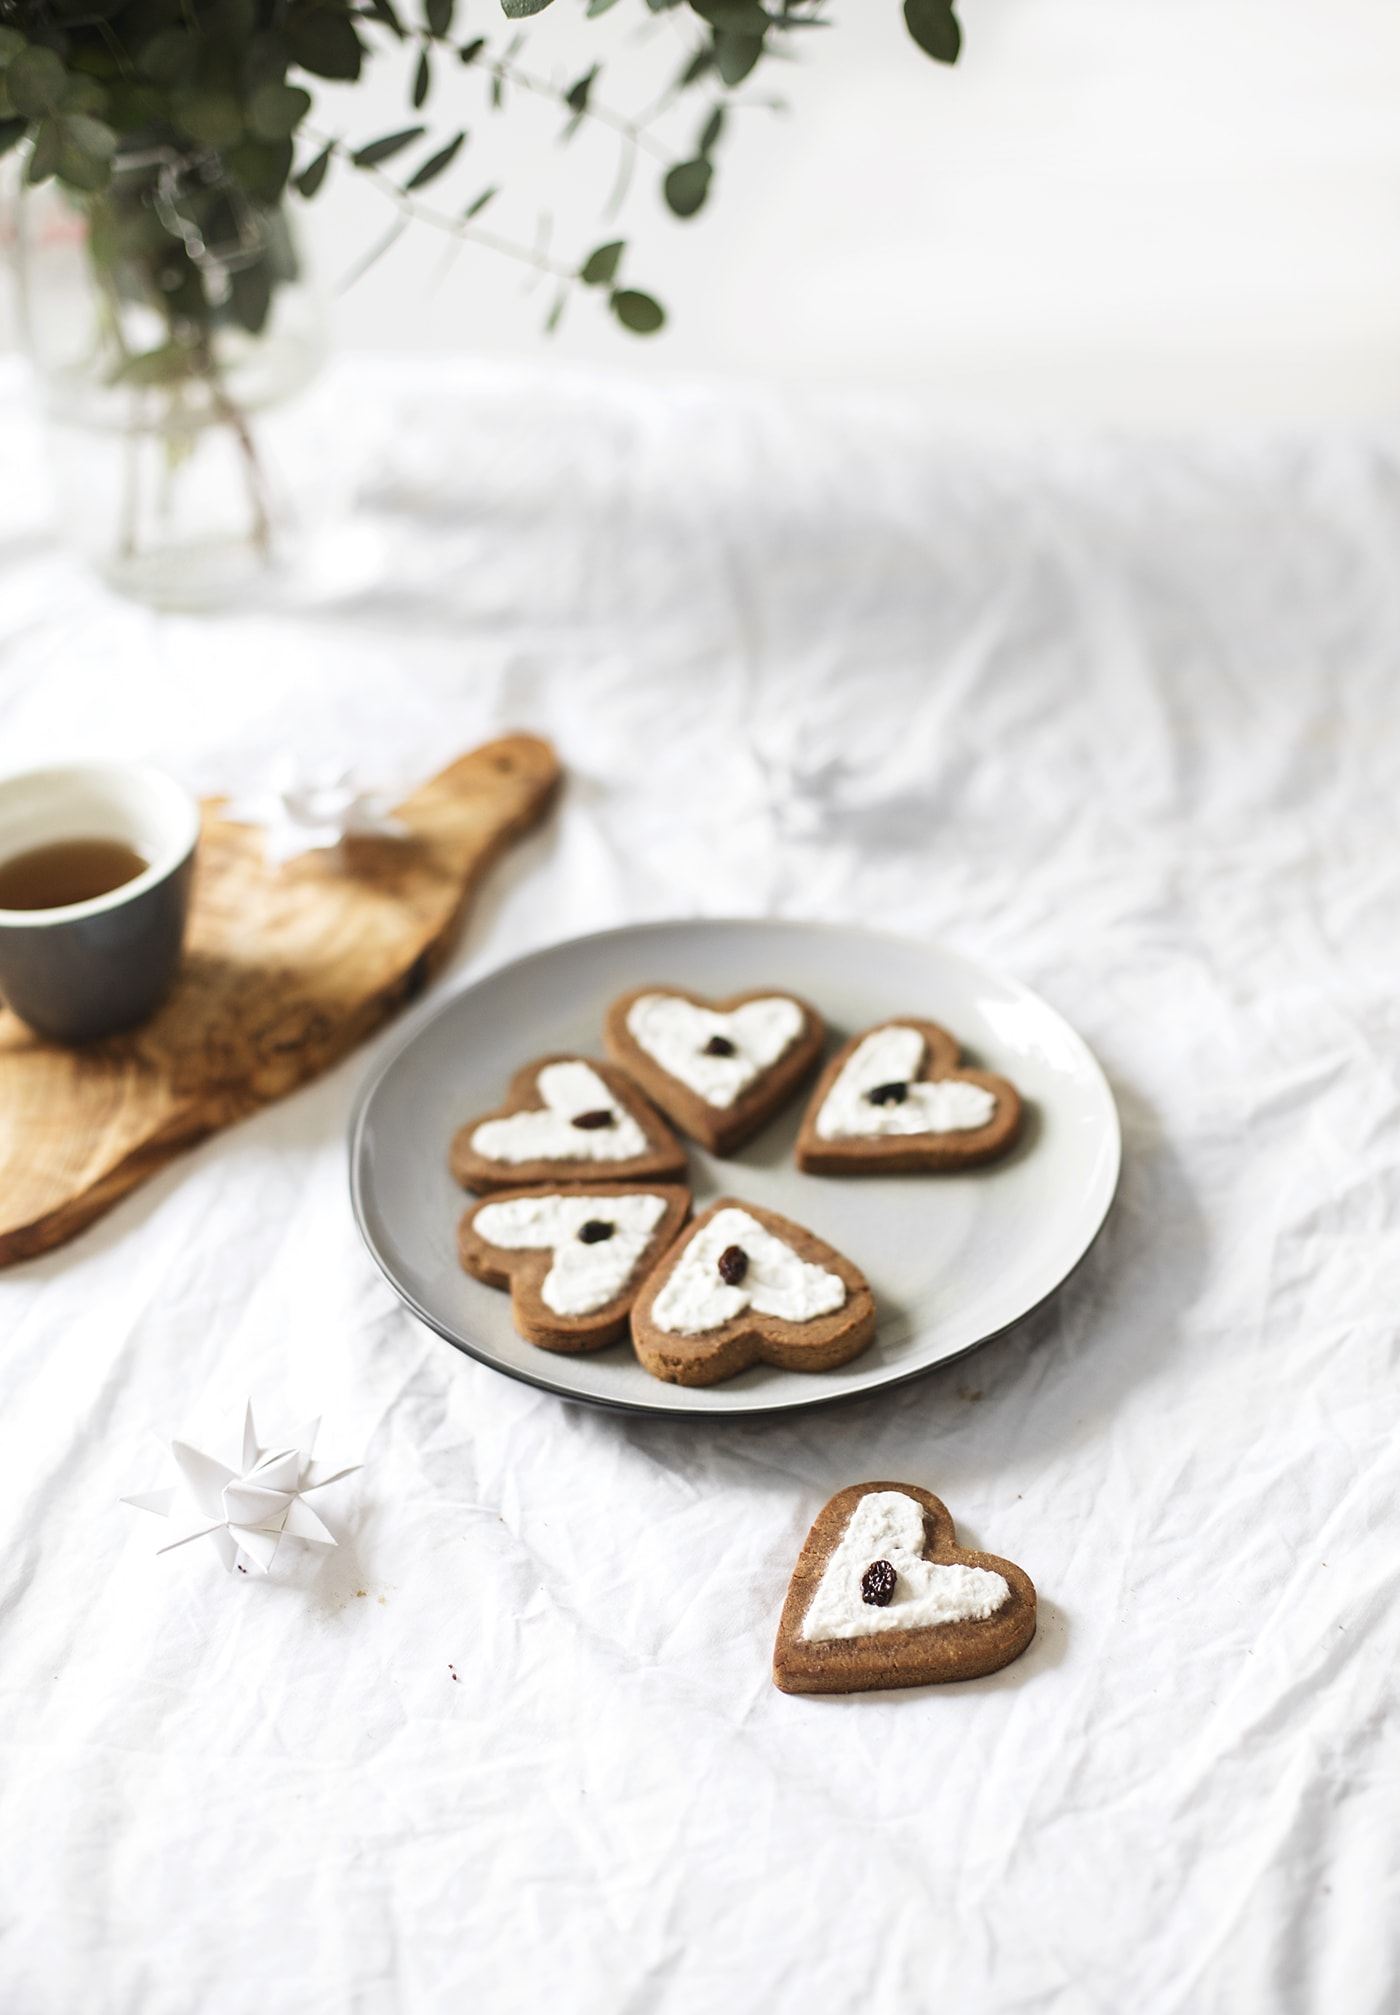 Paleo chestnut flour gingerbread   only 3 ingredients   Christmas desserts   gluten free   vegan   refined sugar free